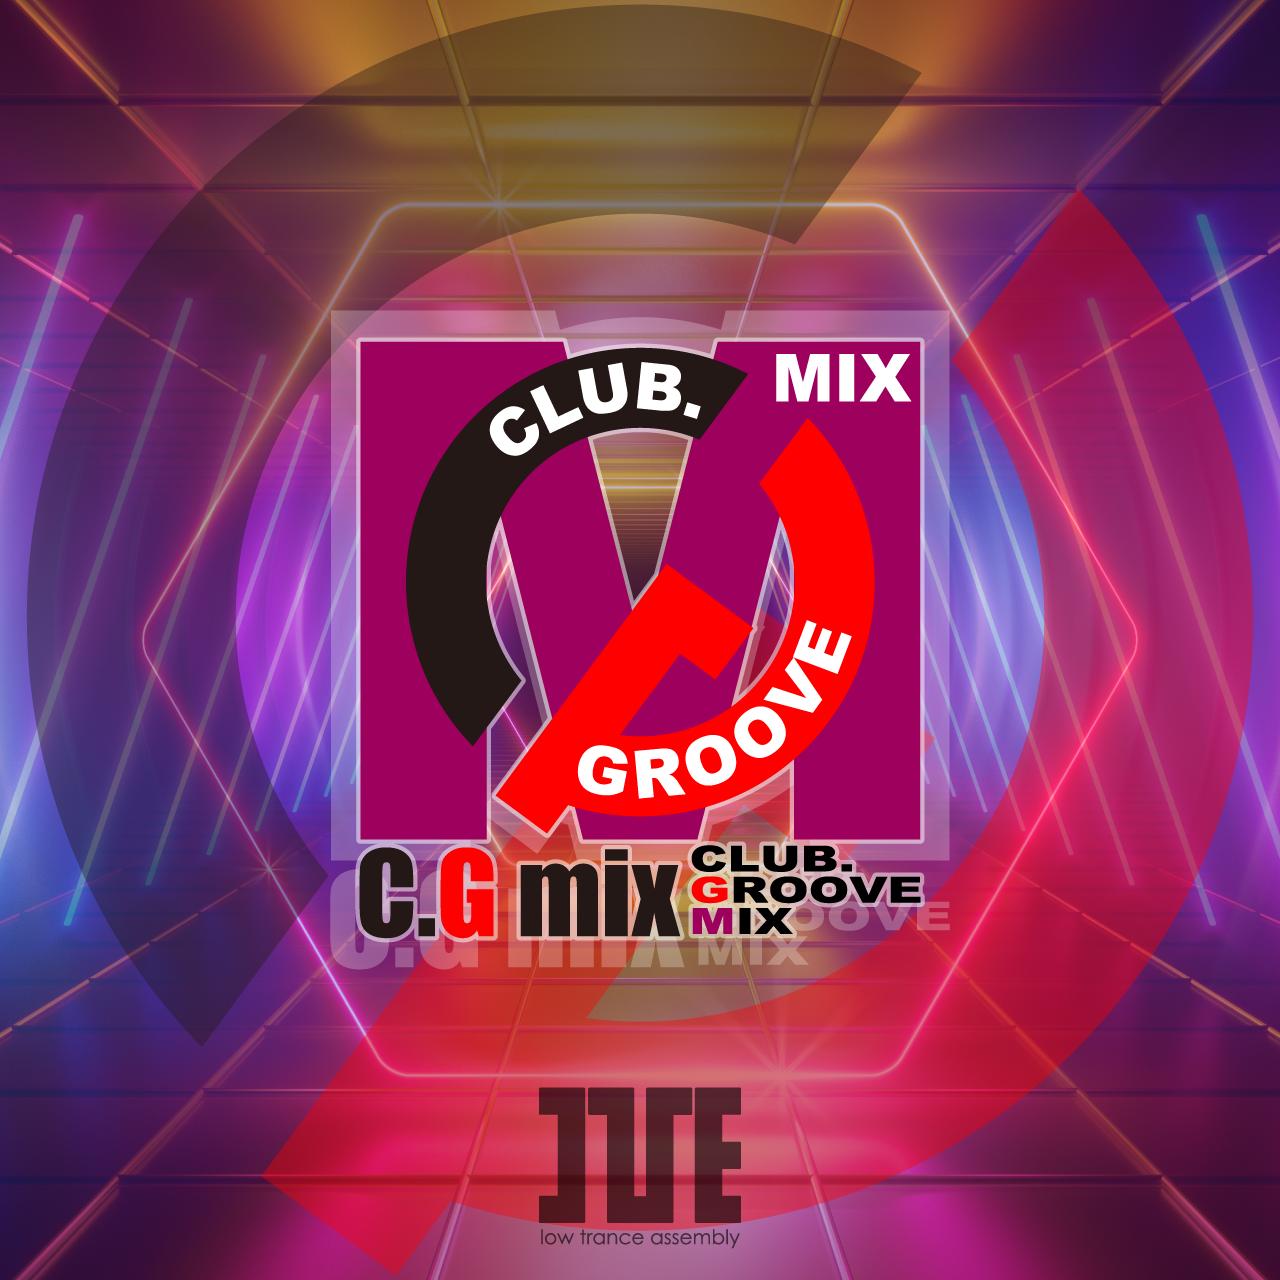 C.G.mix concept mini ALBUM 「Club groove mix」 FC HiRe PACK